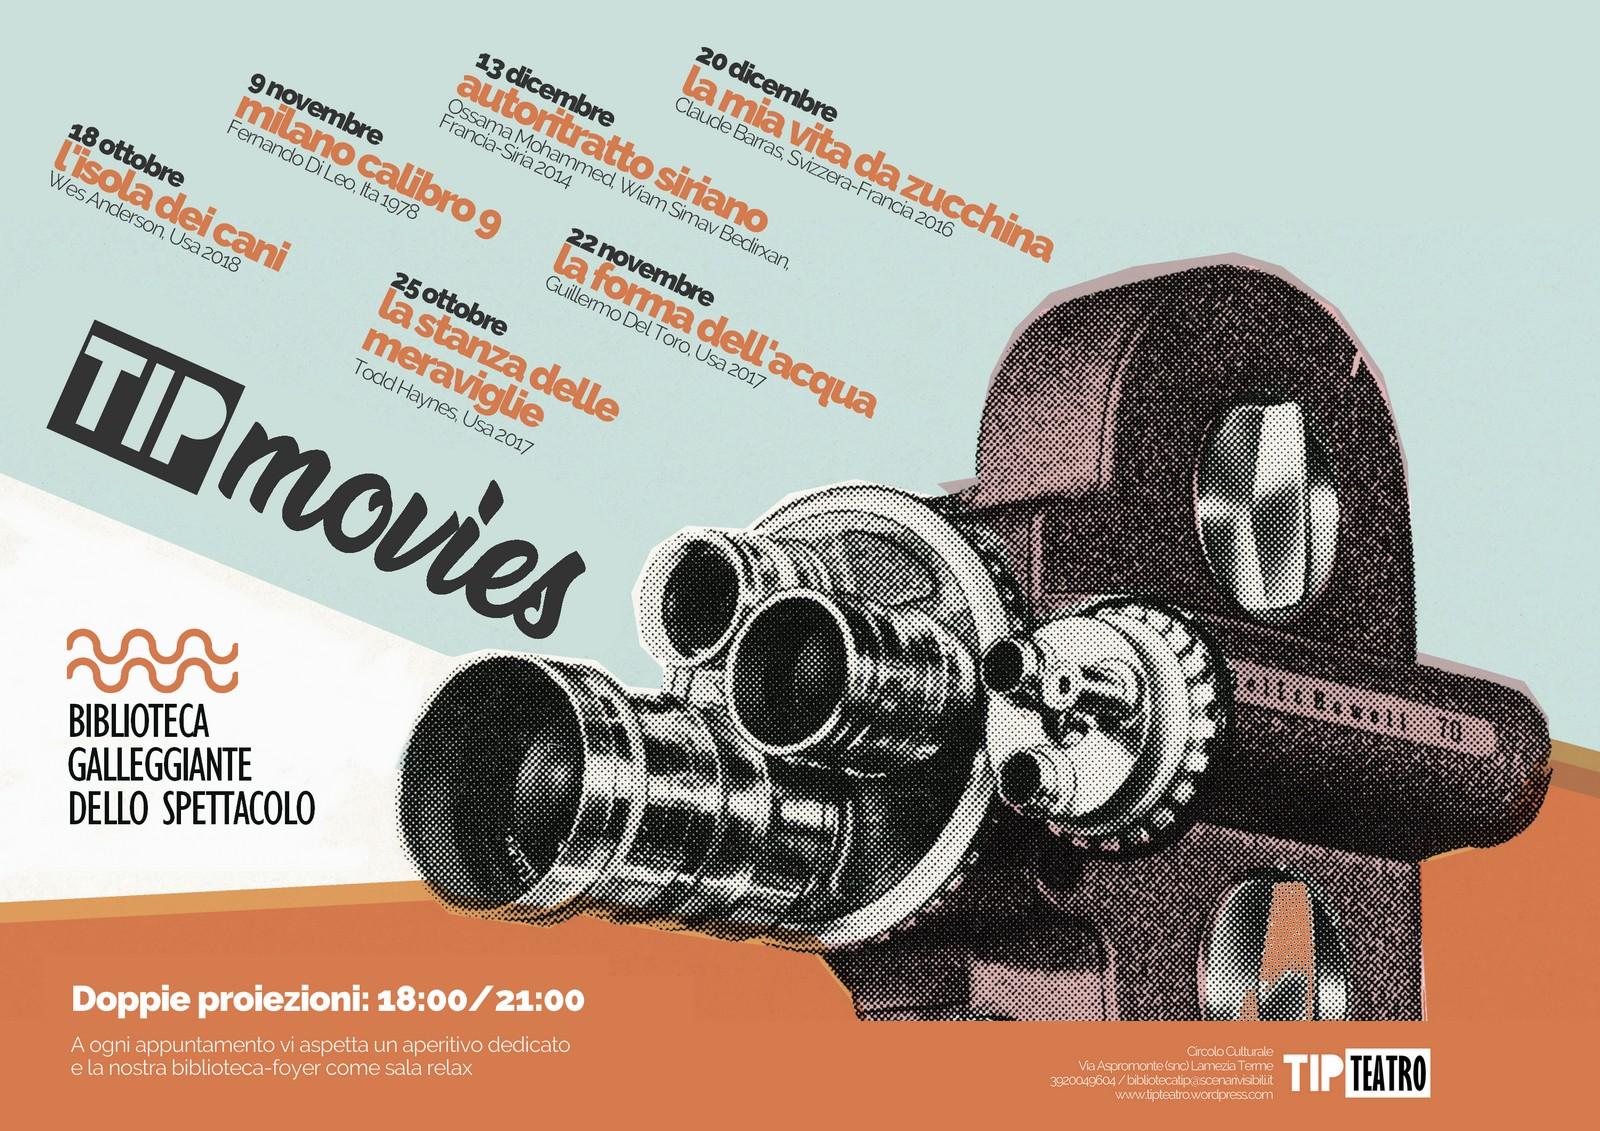 la nuova rassegna del tip teatro-LameziaTermeit